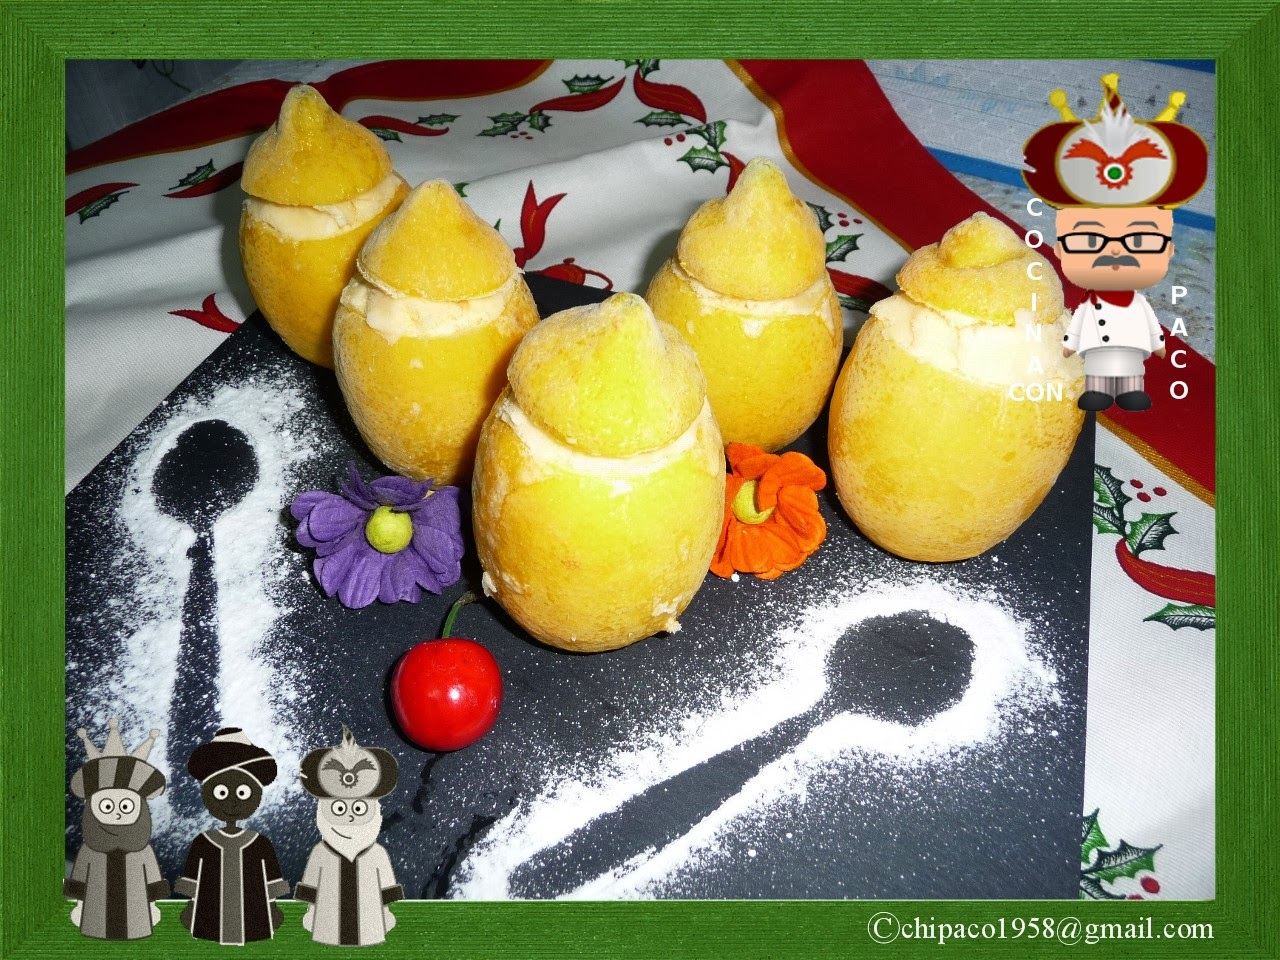 Cocina con paco limones helados - Cocina con paco ...